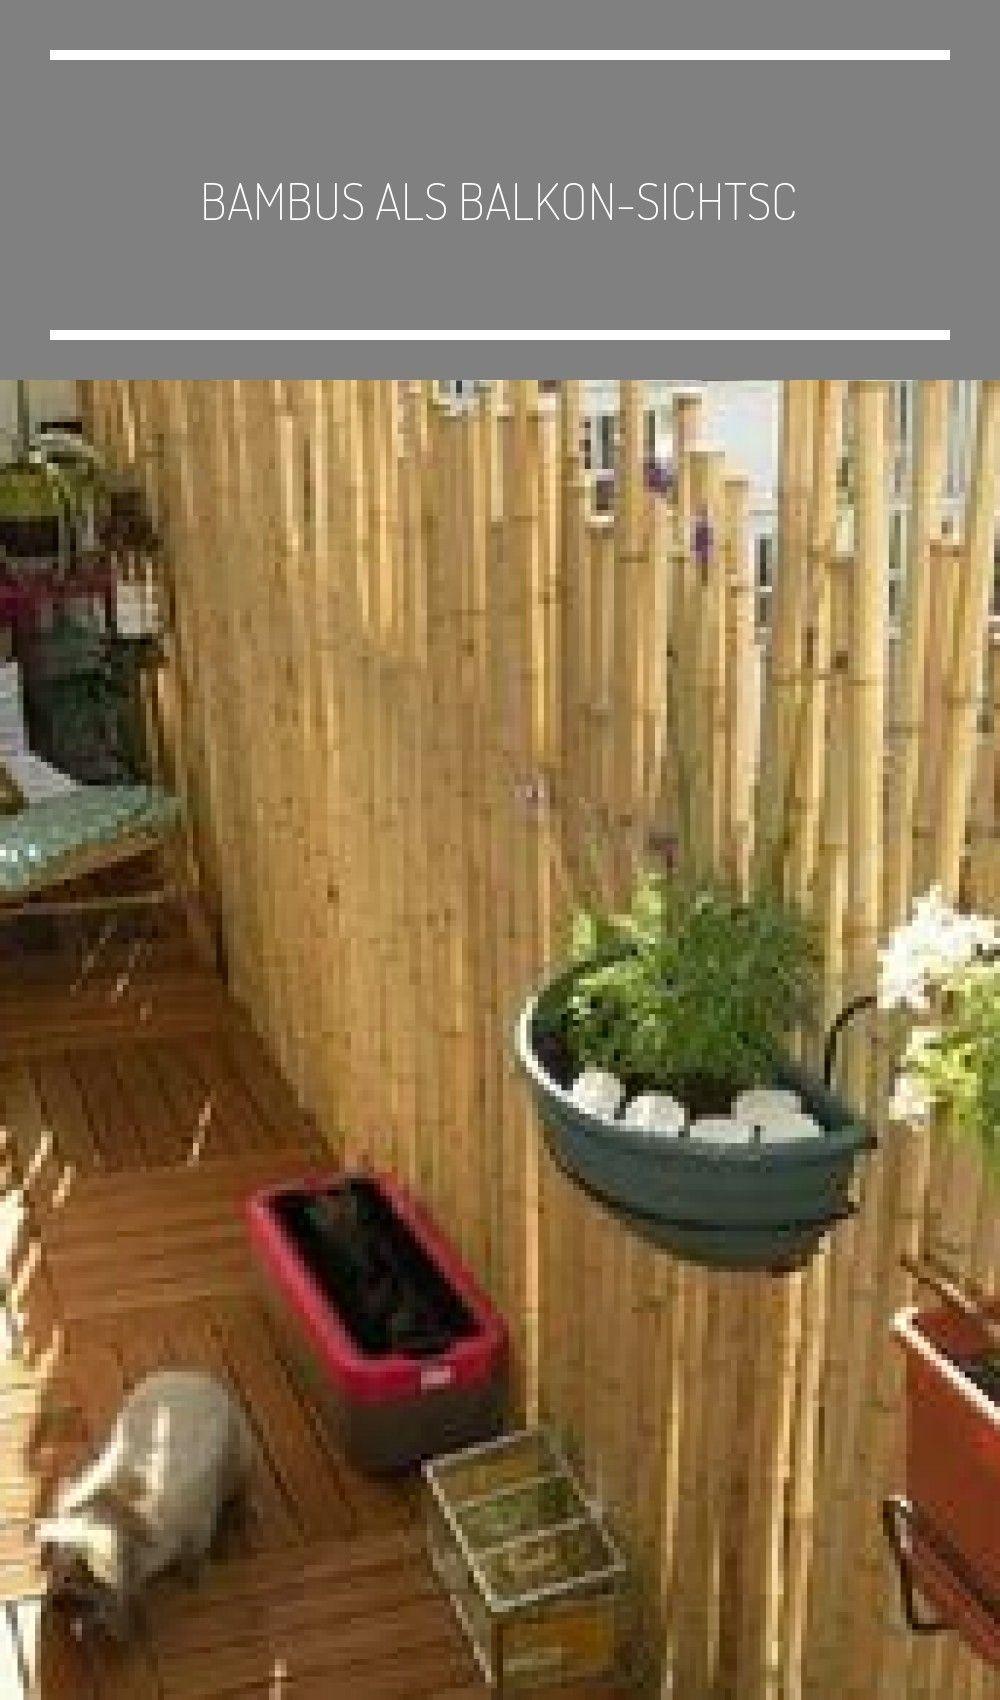 Bambus als BalkonSichtschutz Ideen mit Pflanzen, Matten